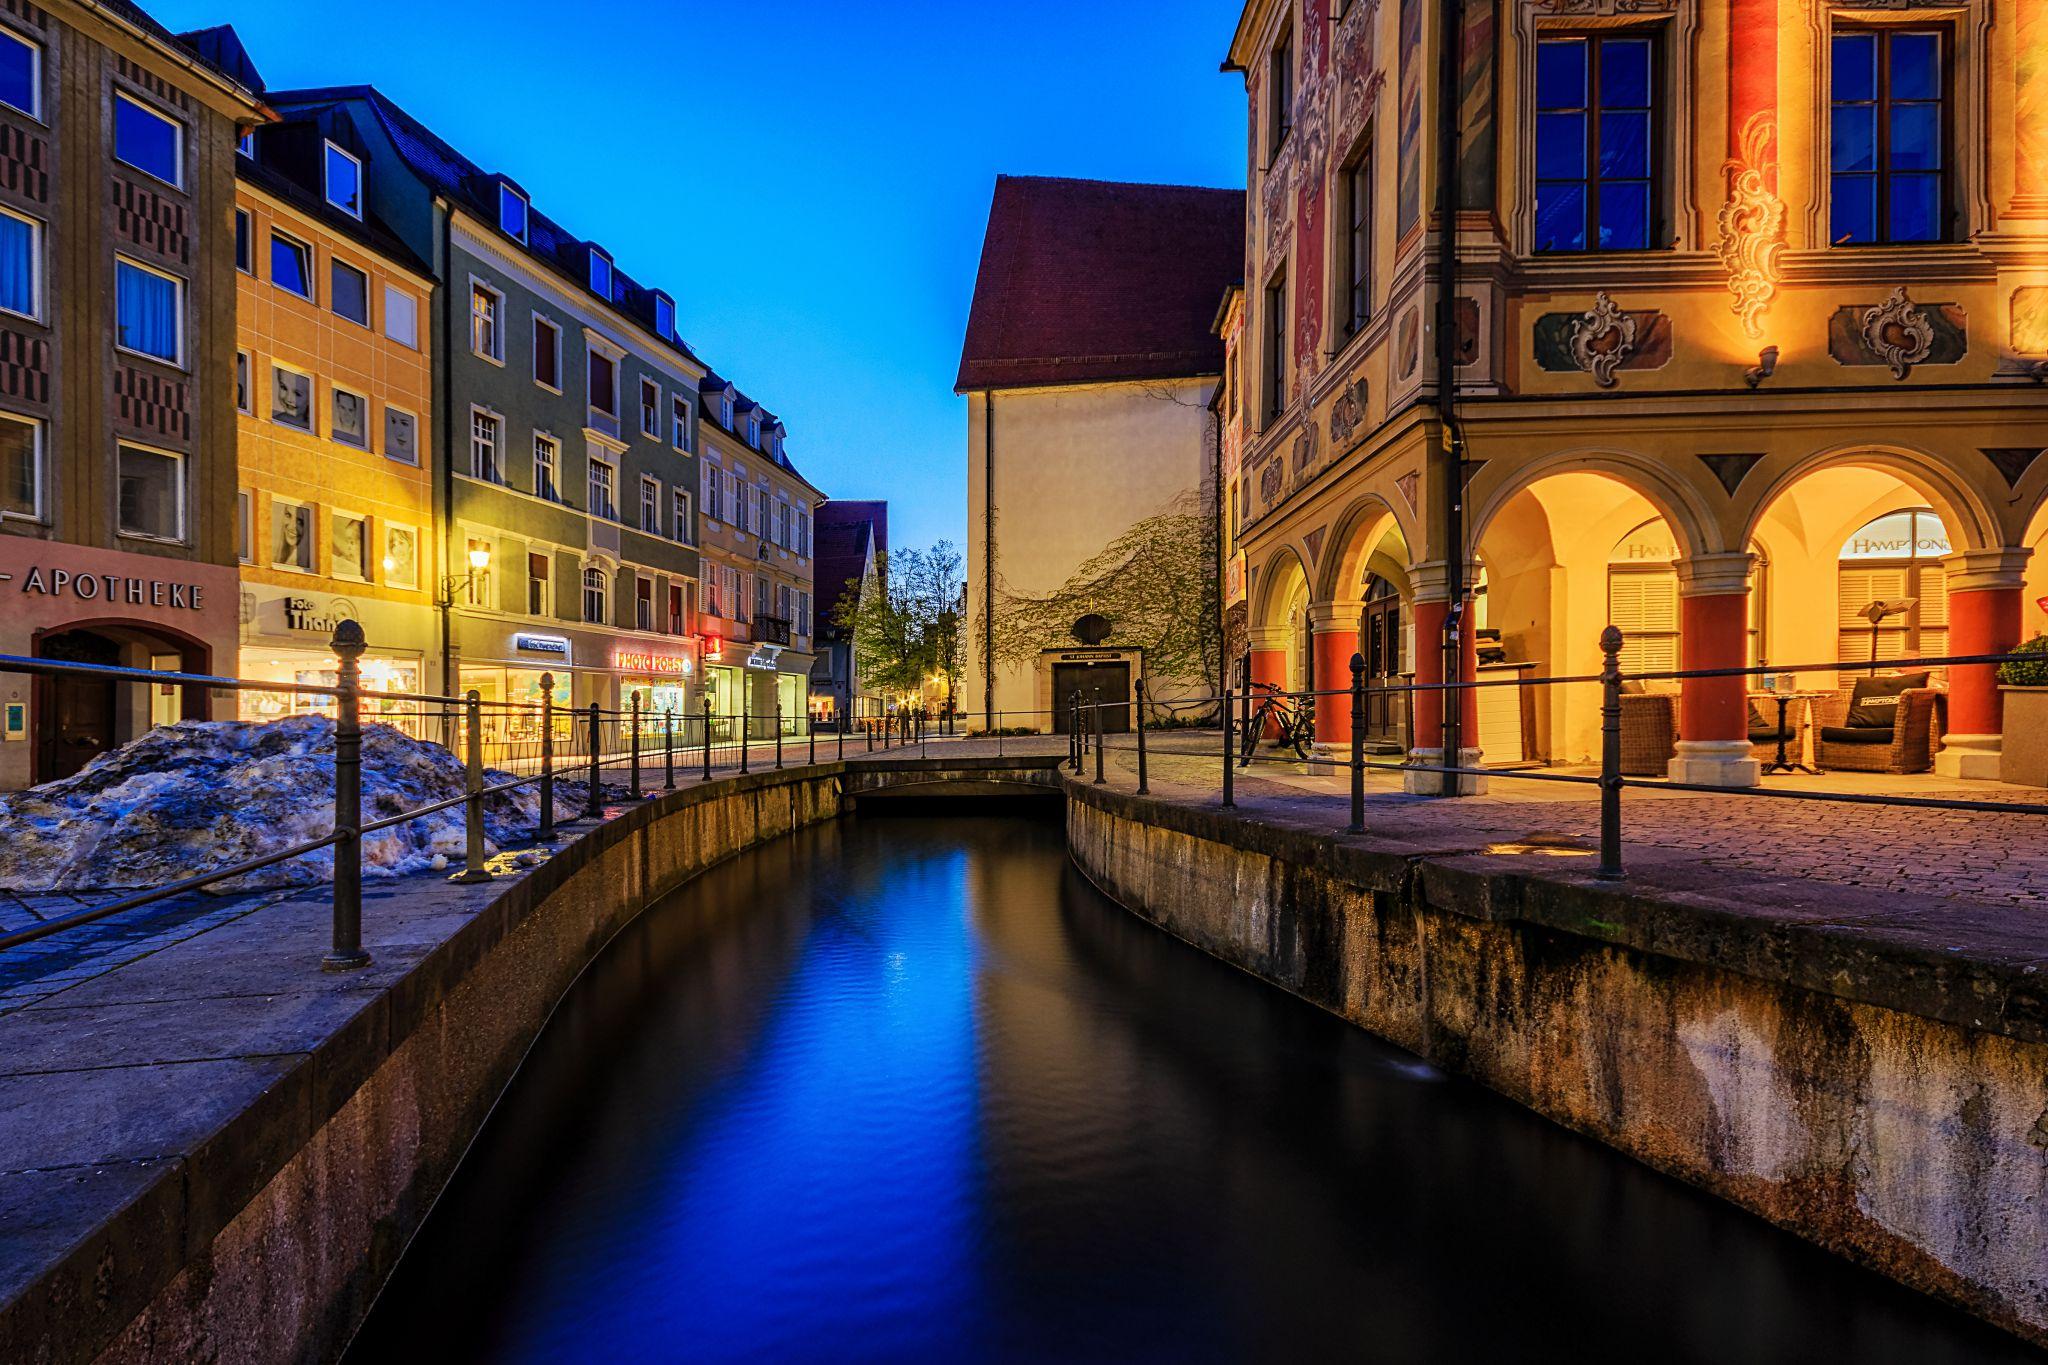 My Hometown, Germany